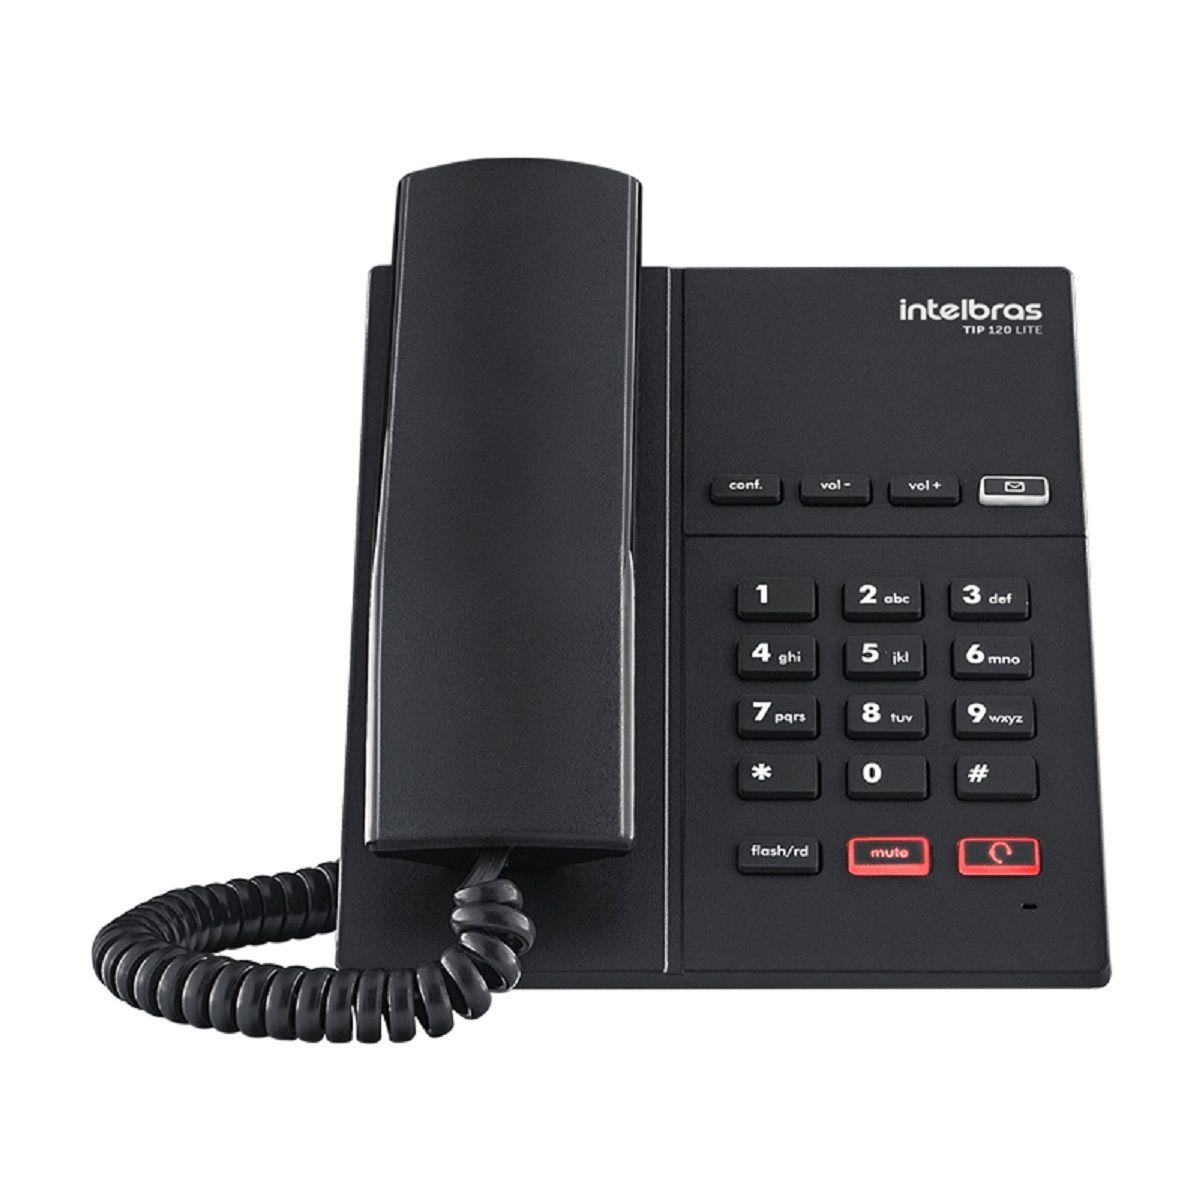 Telefone Tip 120 Lite Intelbras